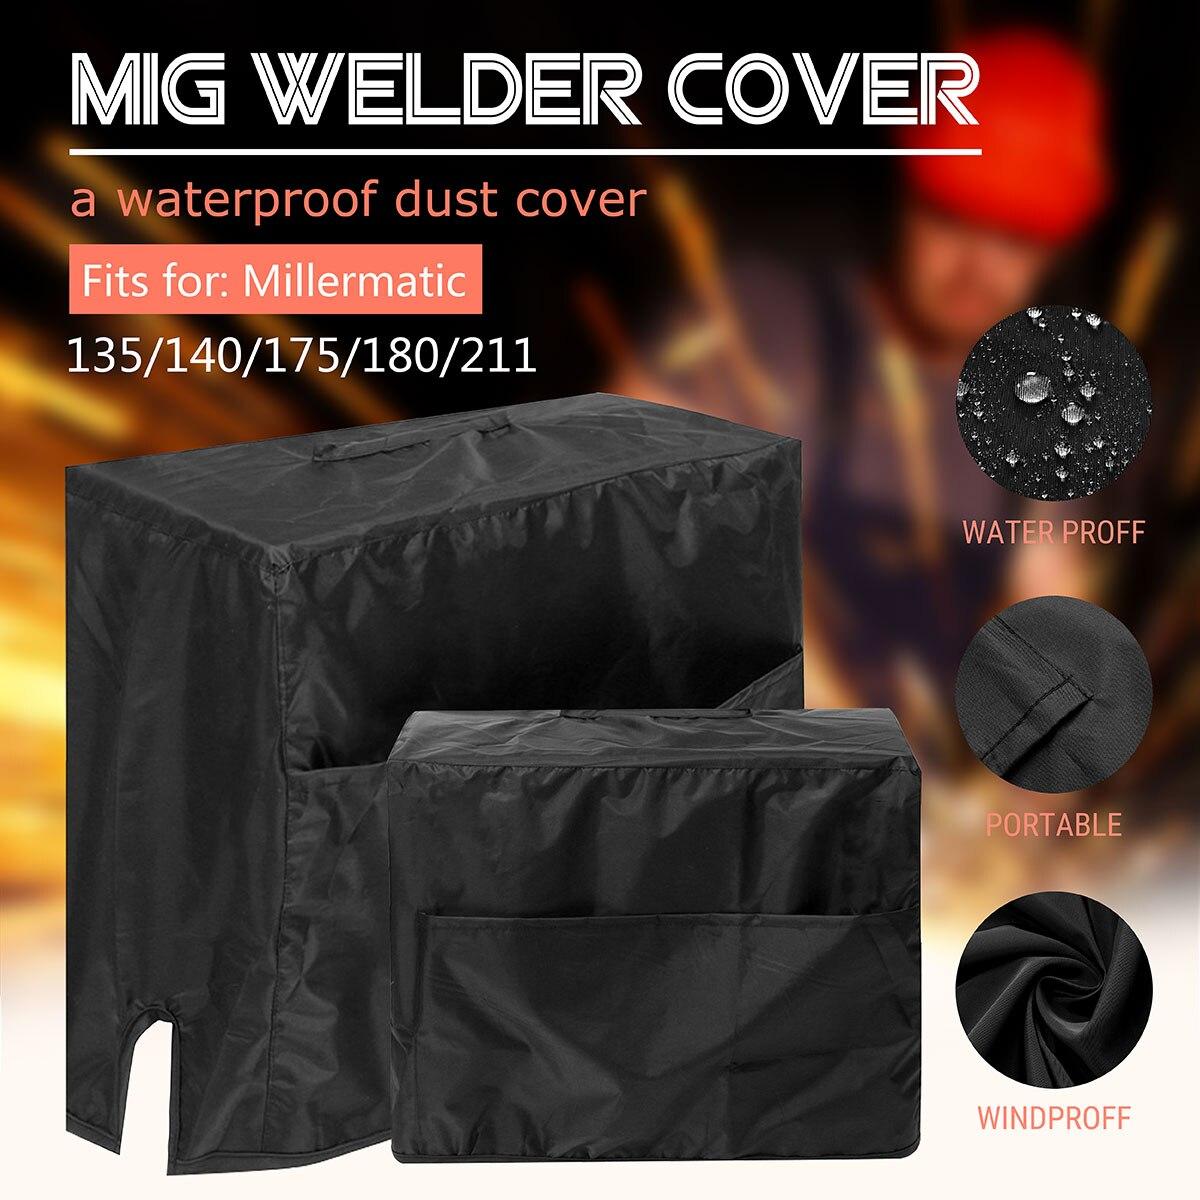 47x28x37cm MIG Welder Cover Waterproof Welding Machine Canopy Sunscreen Dust Cover